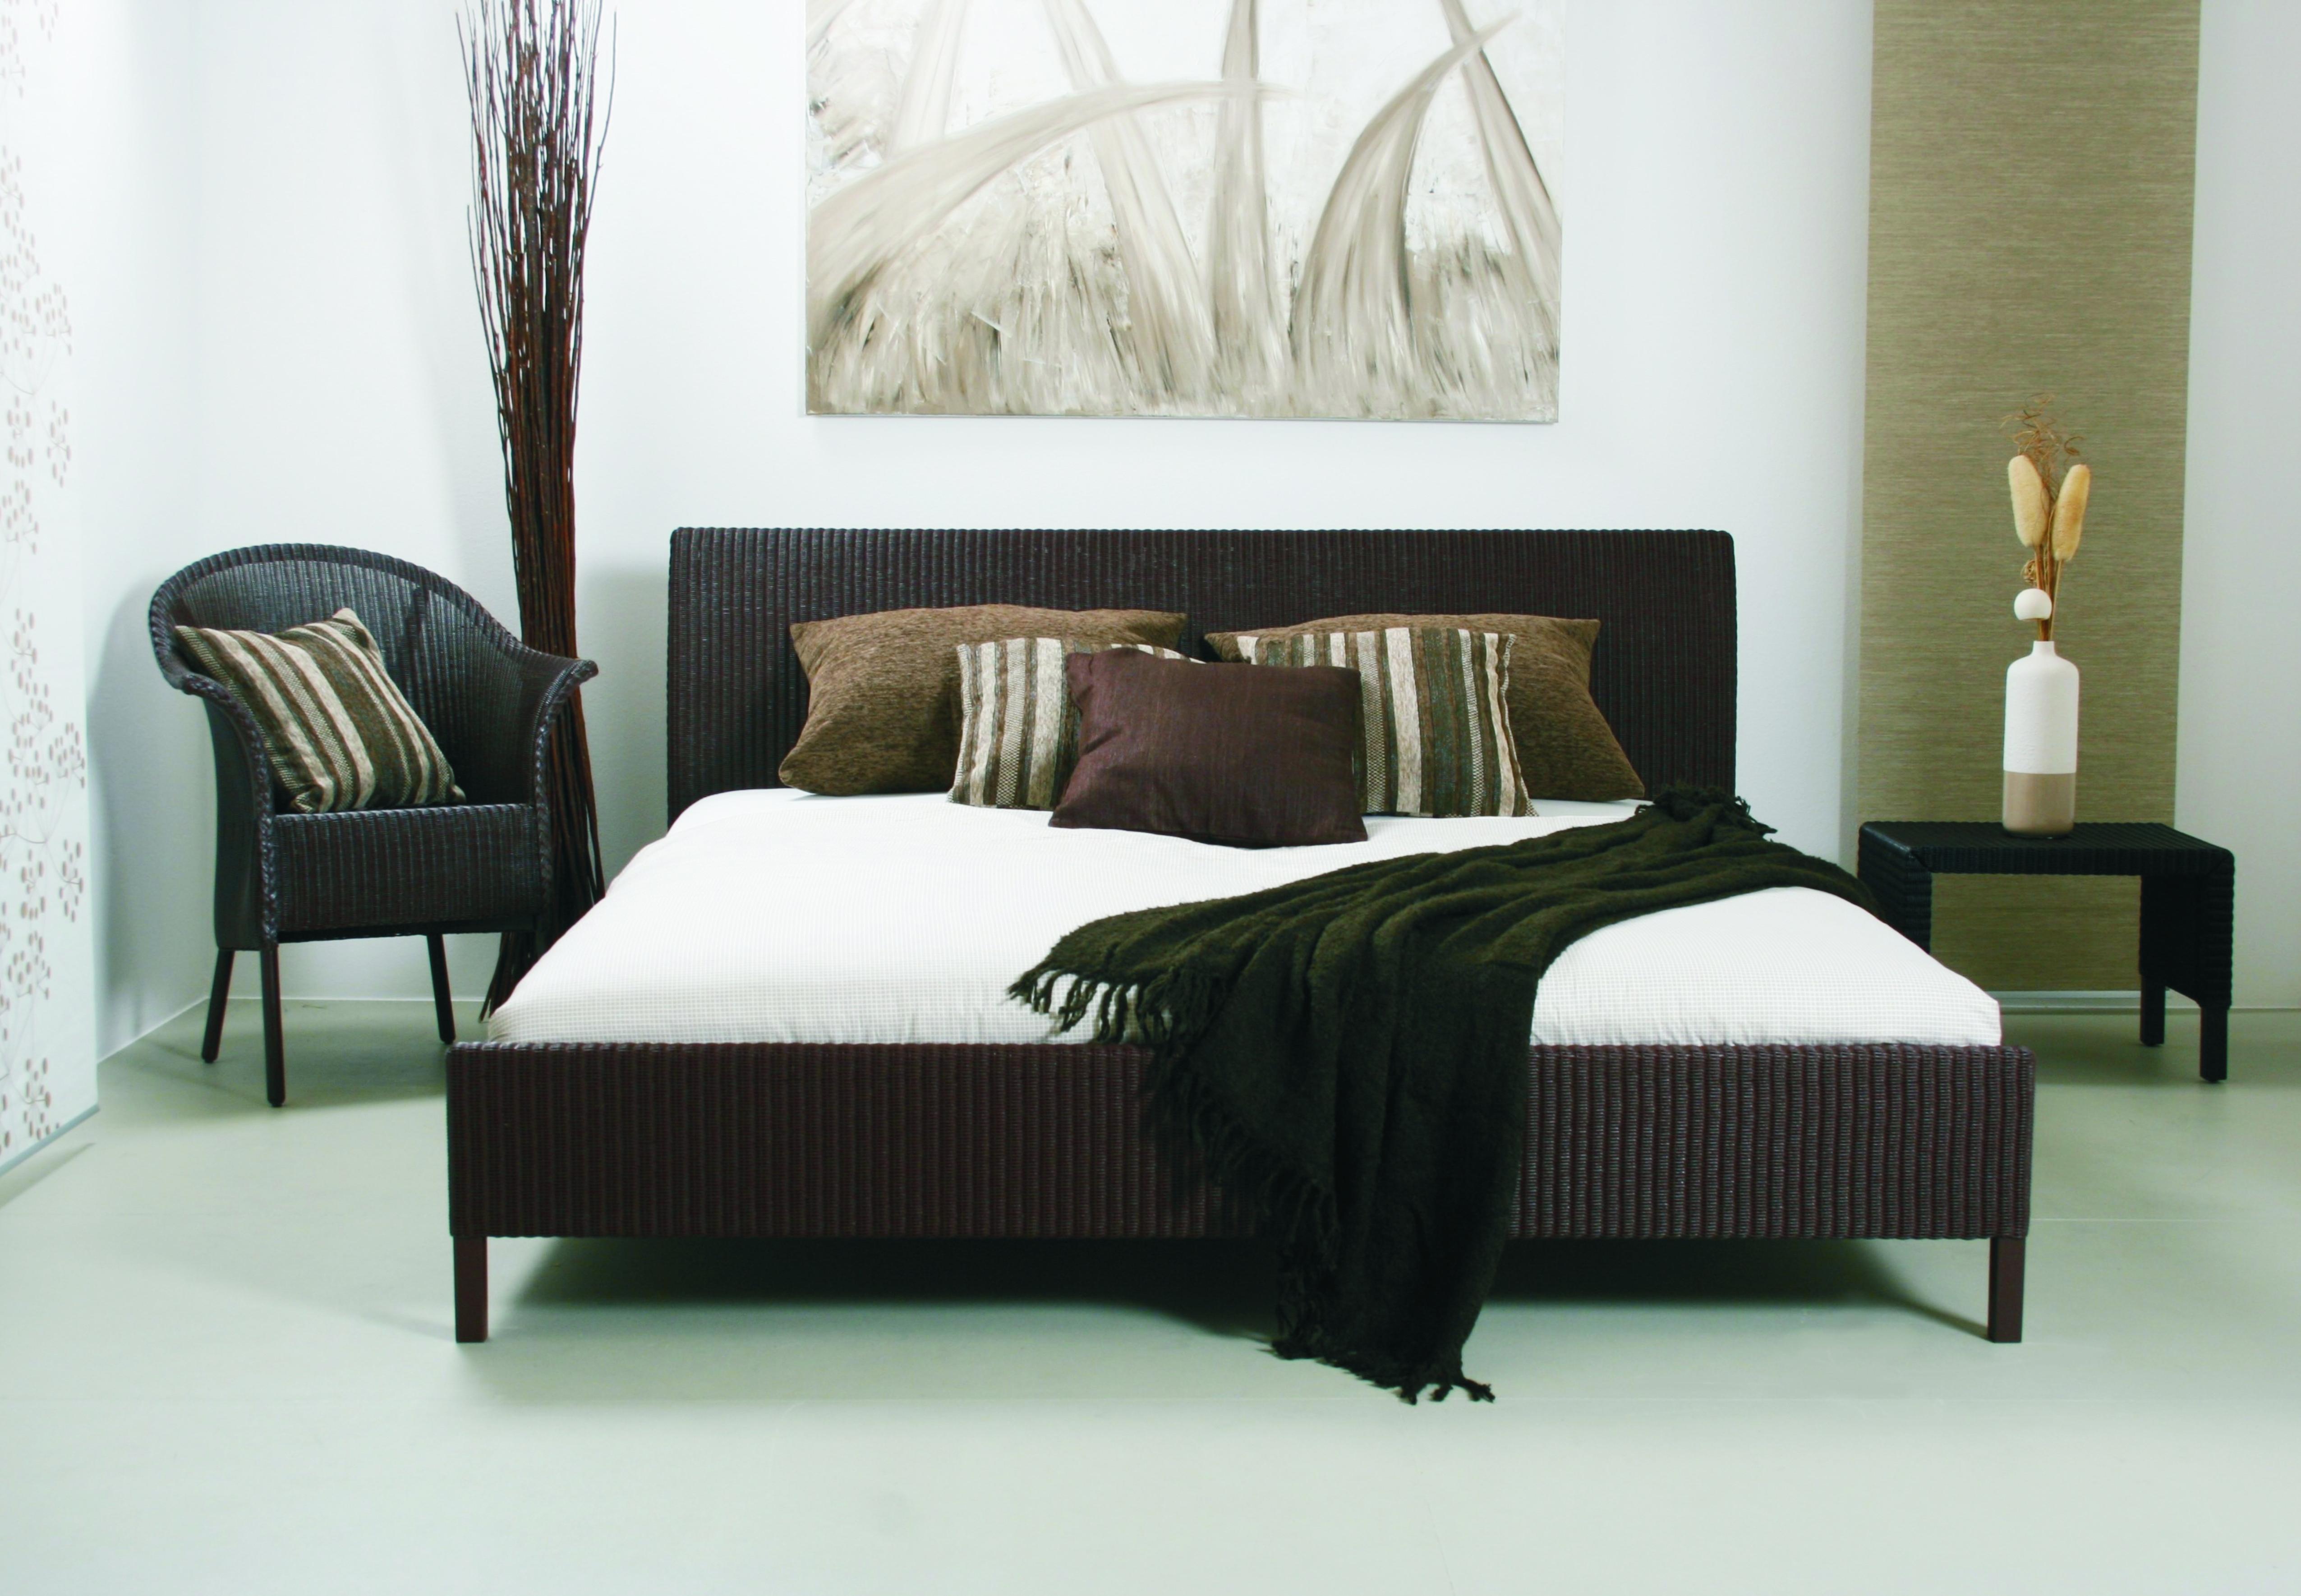 loombett model 609 rattan korbhaus. Black Bedroom Furniture Sets. Home Design Ideas